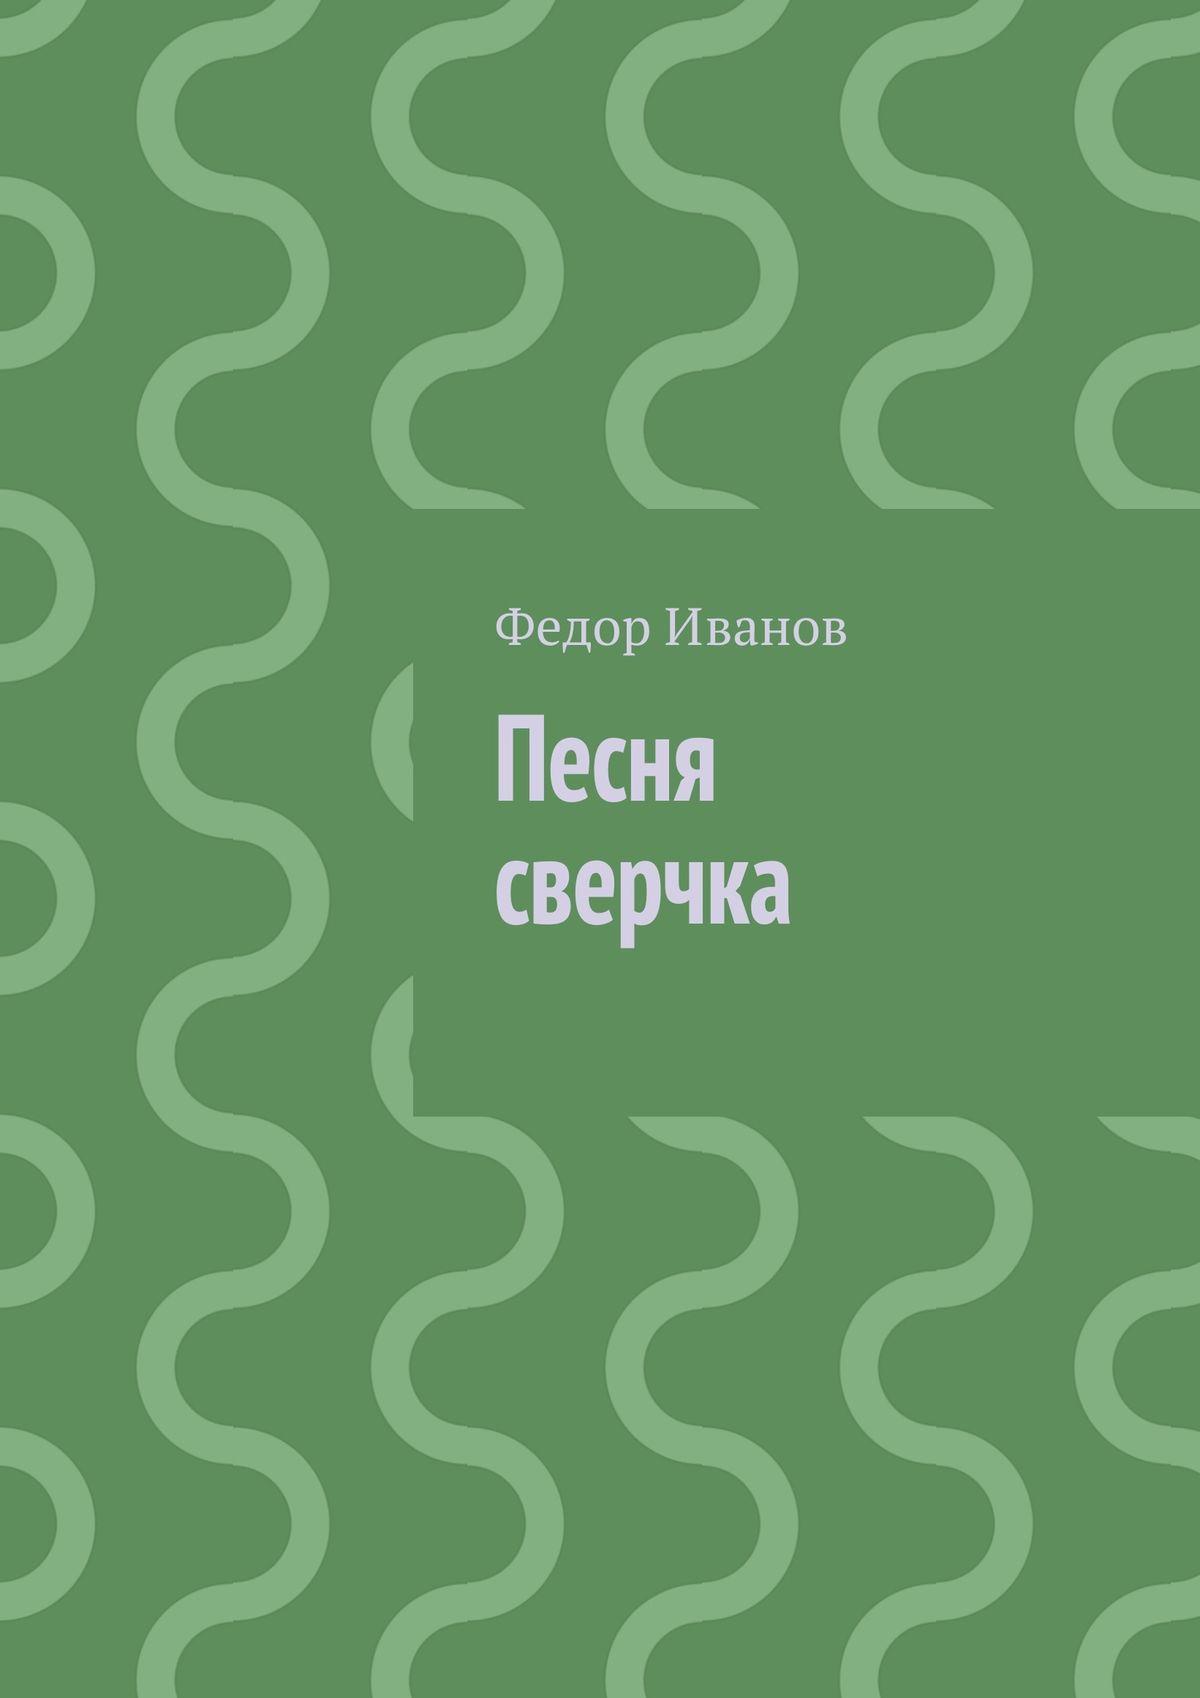 Федор Федорович Иванов Песня сверчка